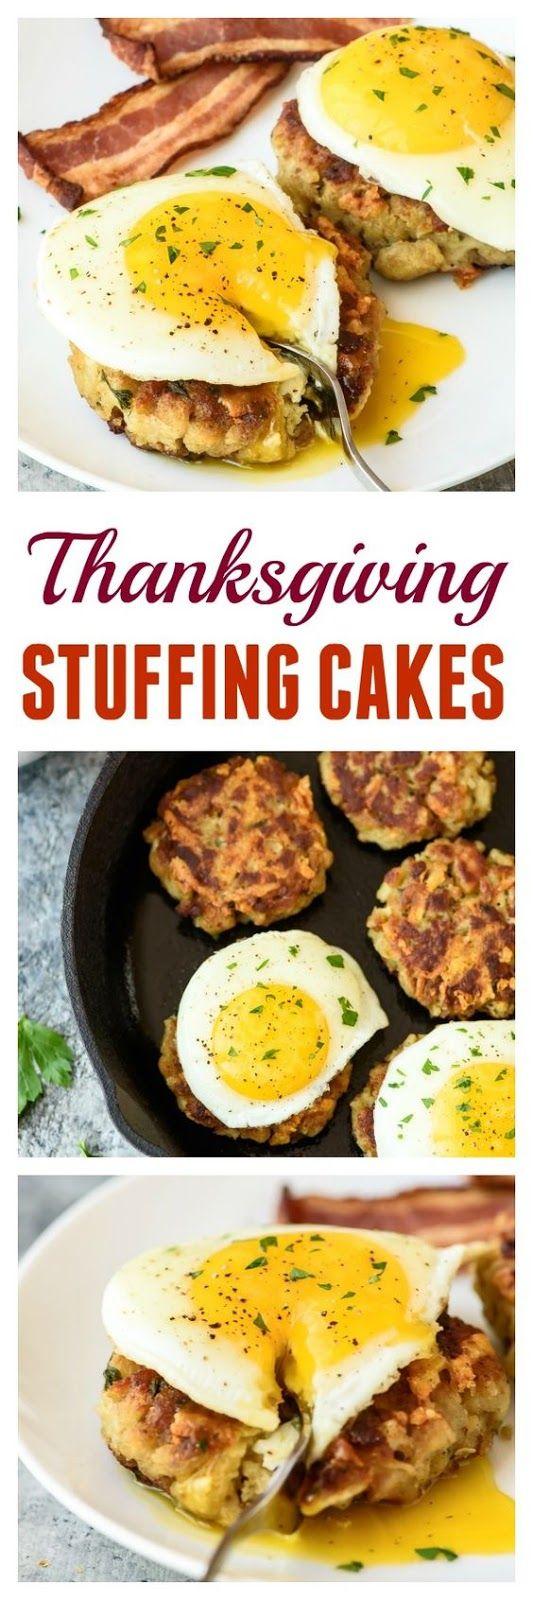 Best 25+ Thanksgiving cakes ideas on Pinterest ...